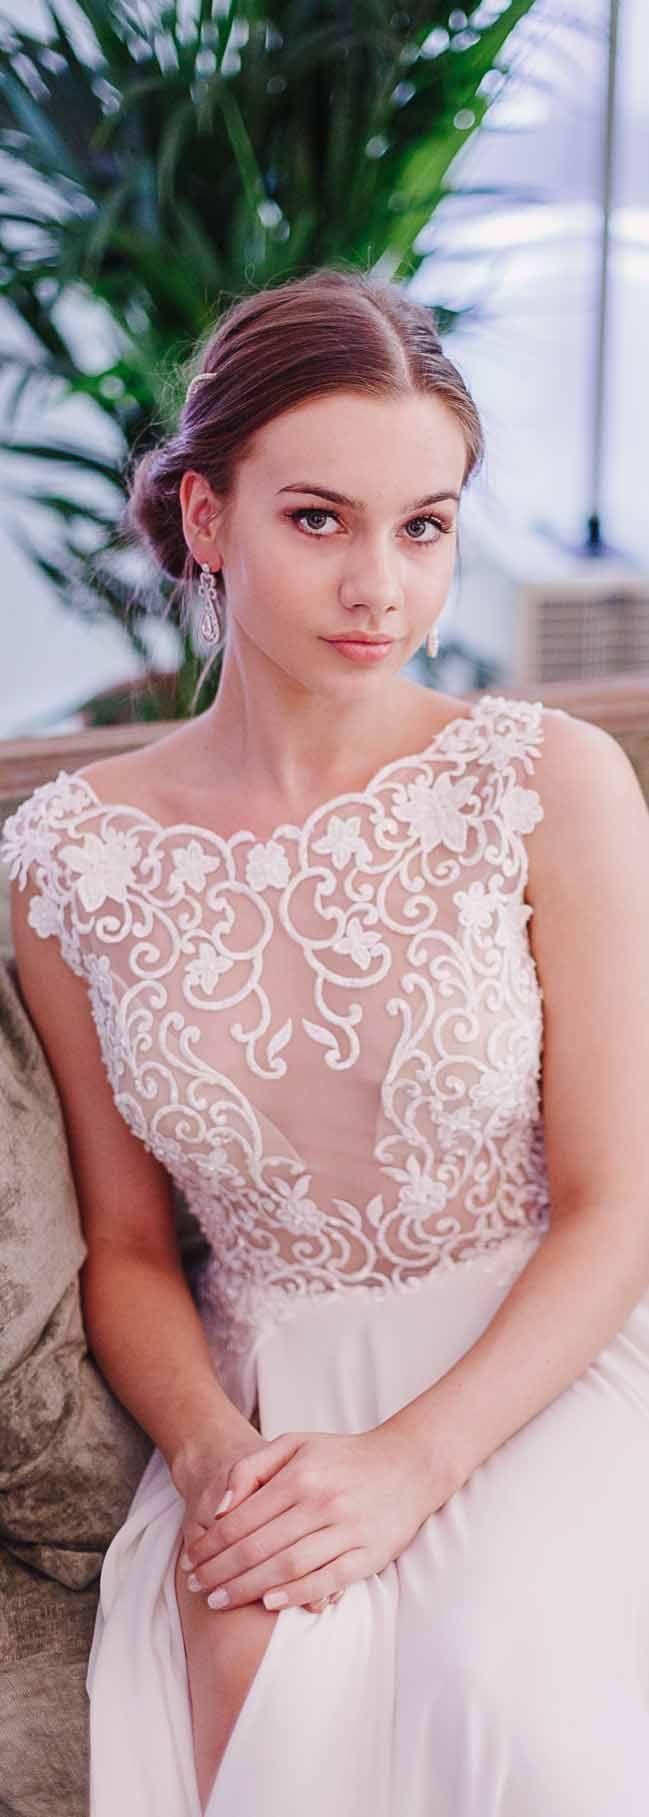 213 best Vestidos madre de la novia images on Pinterest | Grooms ...